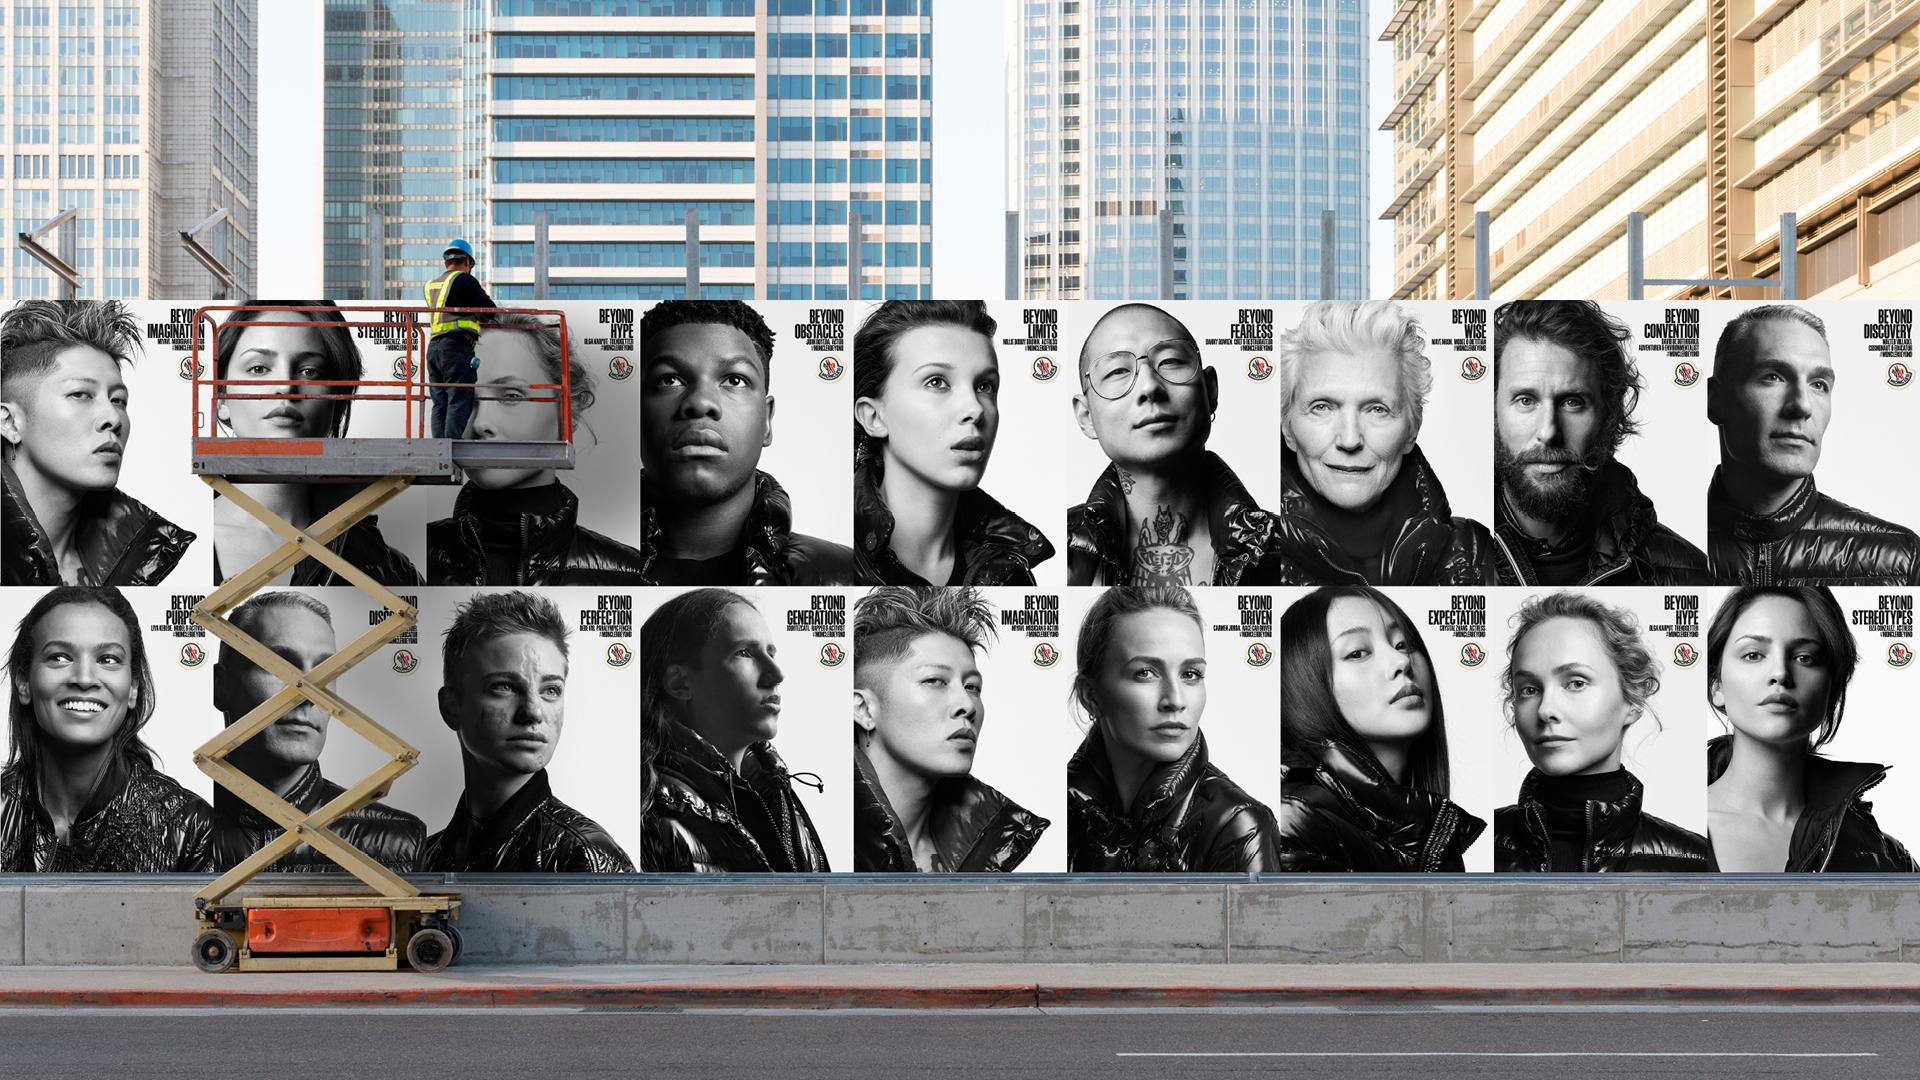 Moncler lancia Beyond, la campagna Autunno Inverno 2018 2019 | Collater.al 20